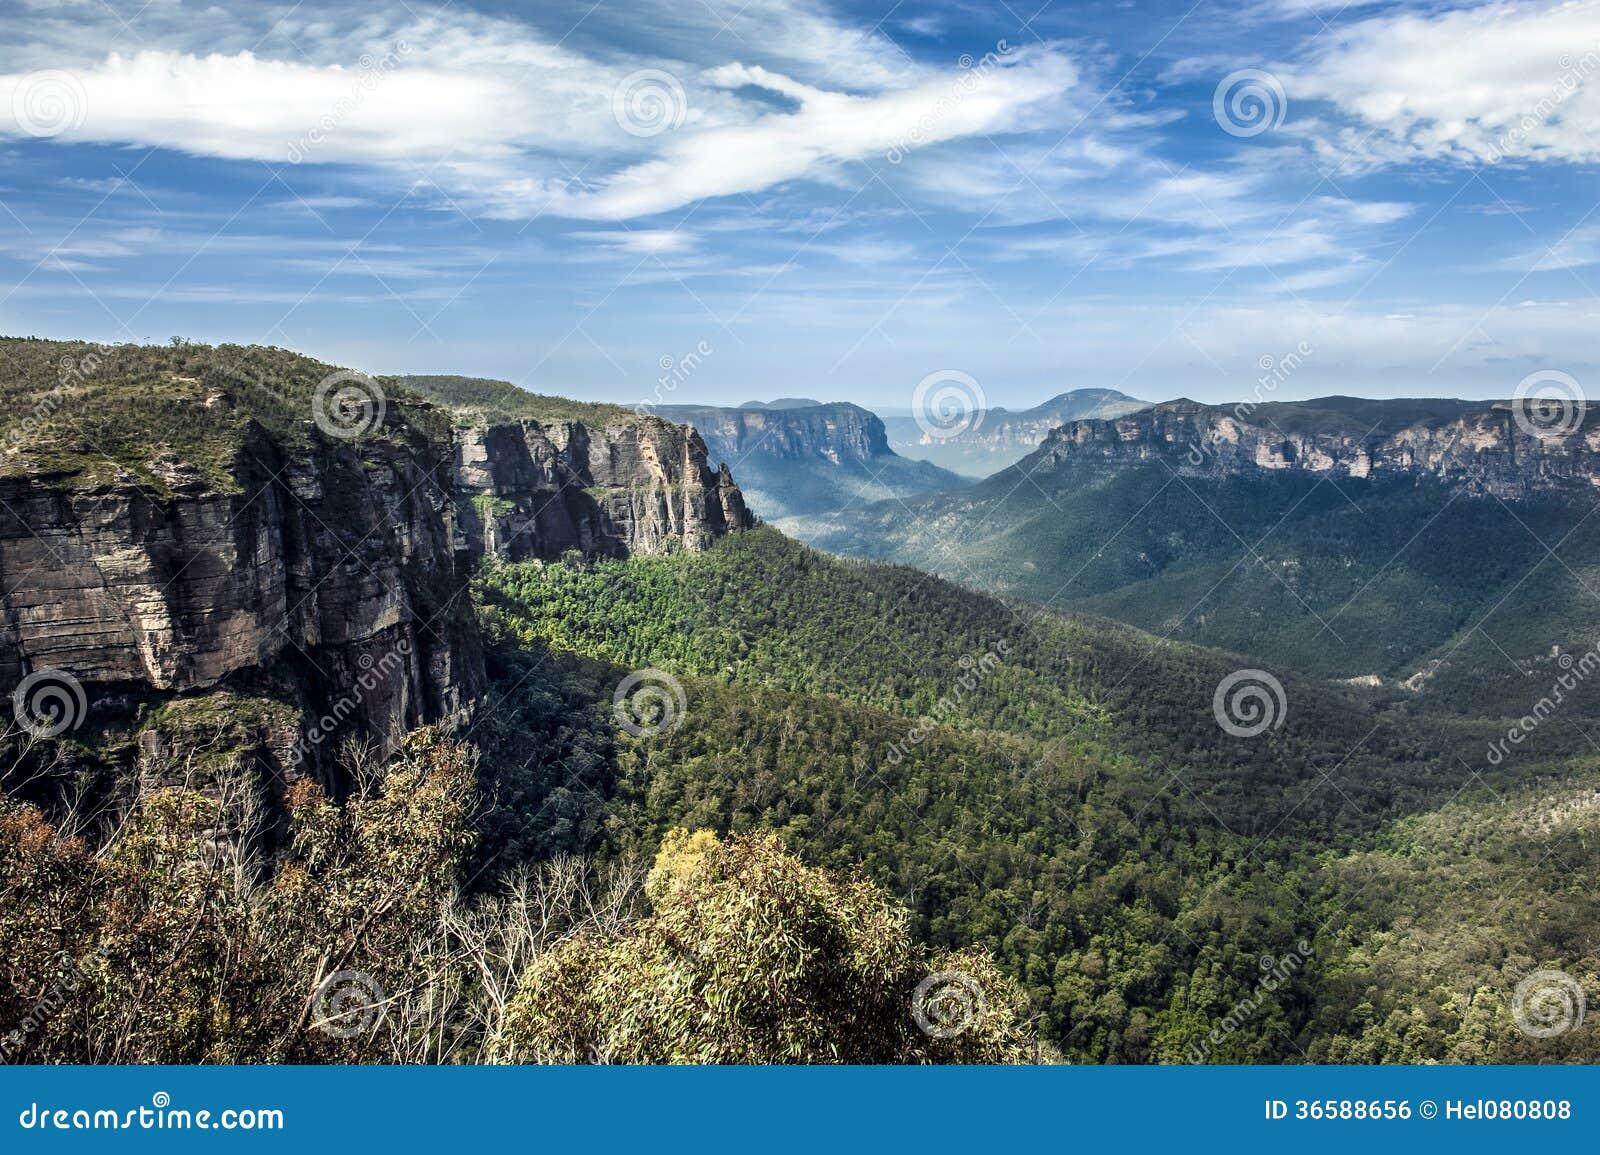 Download Blue Mountains, Australia stock photo. Image of scenery - 36588656